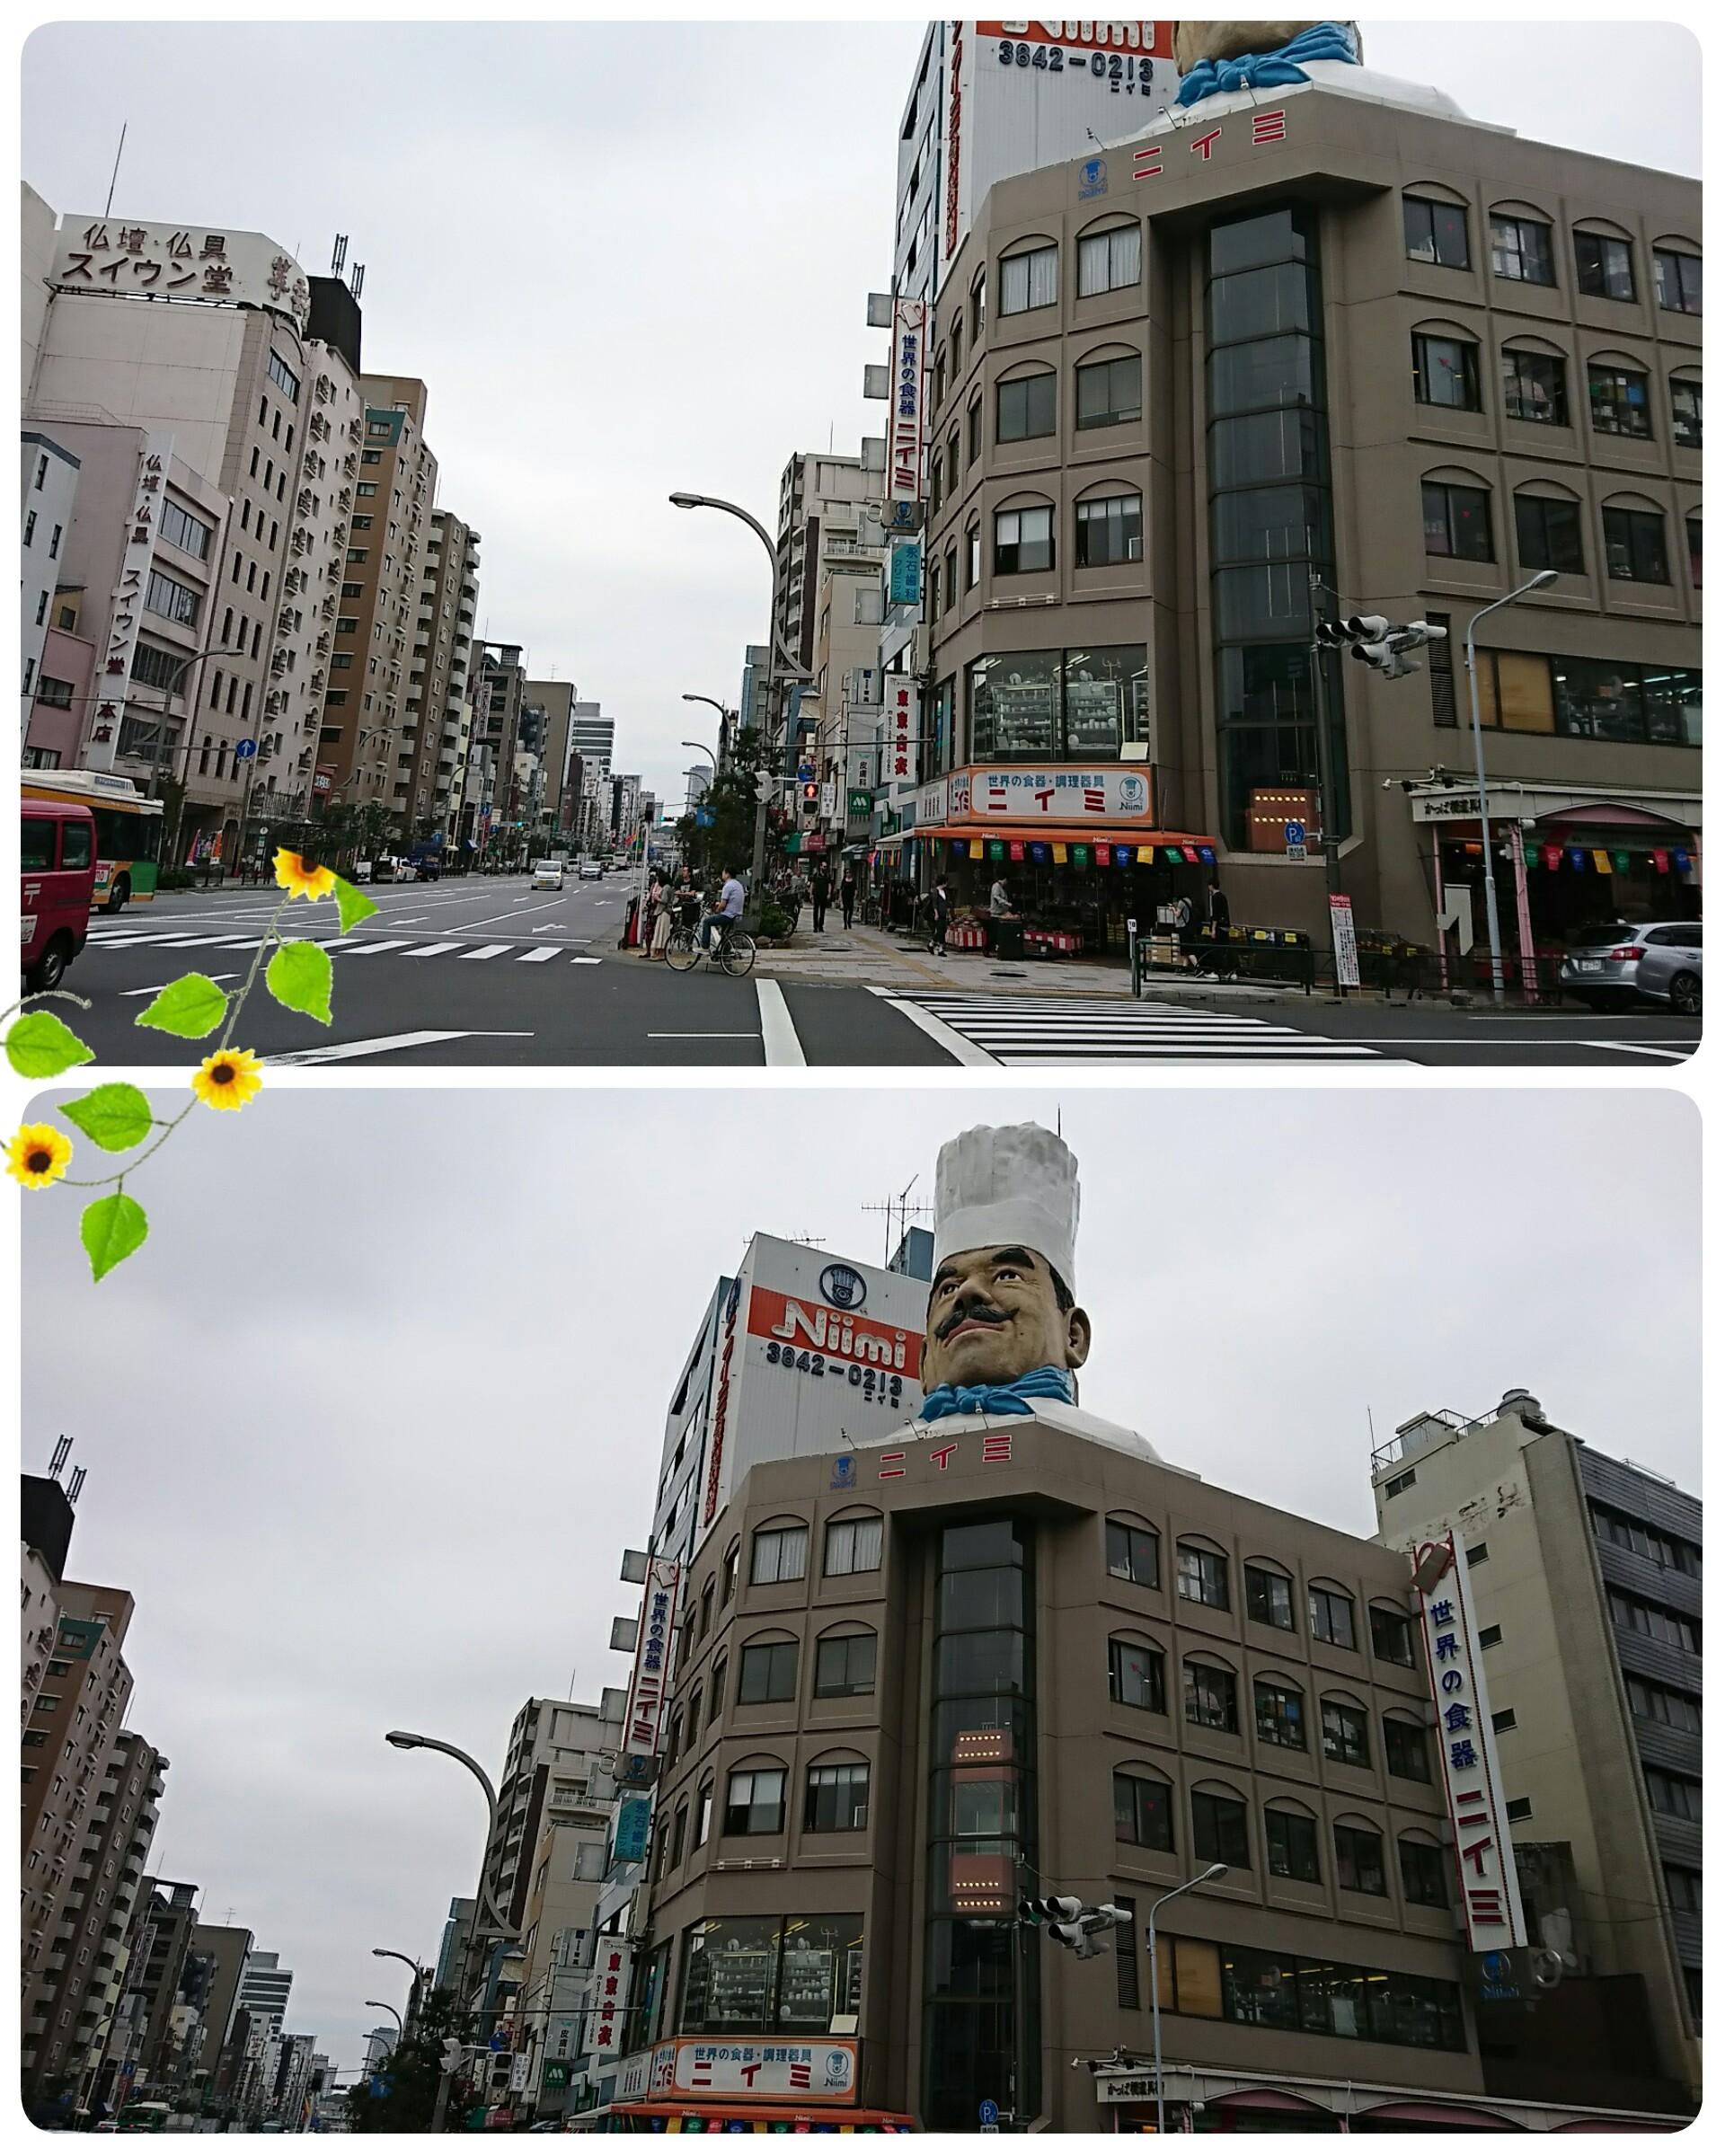 f:id:sunflower-shigeaki:20171007230840j:image